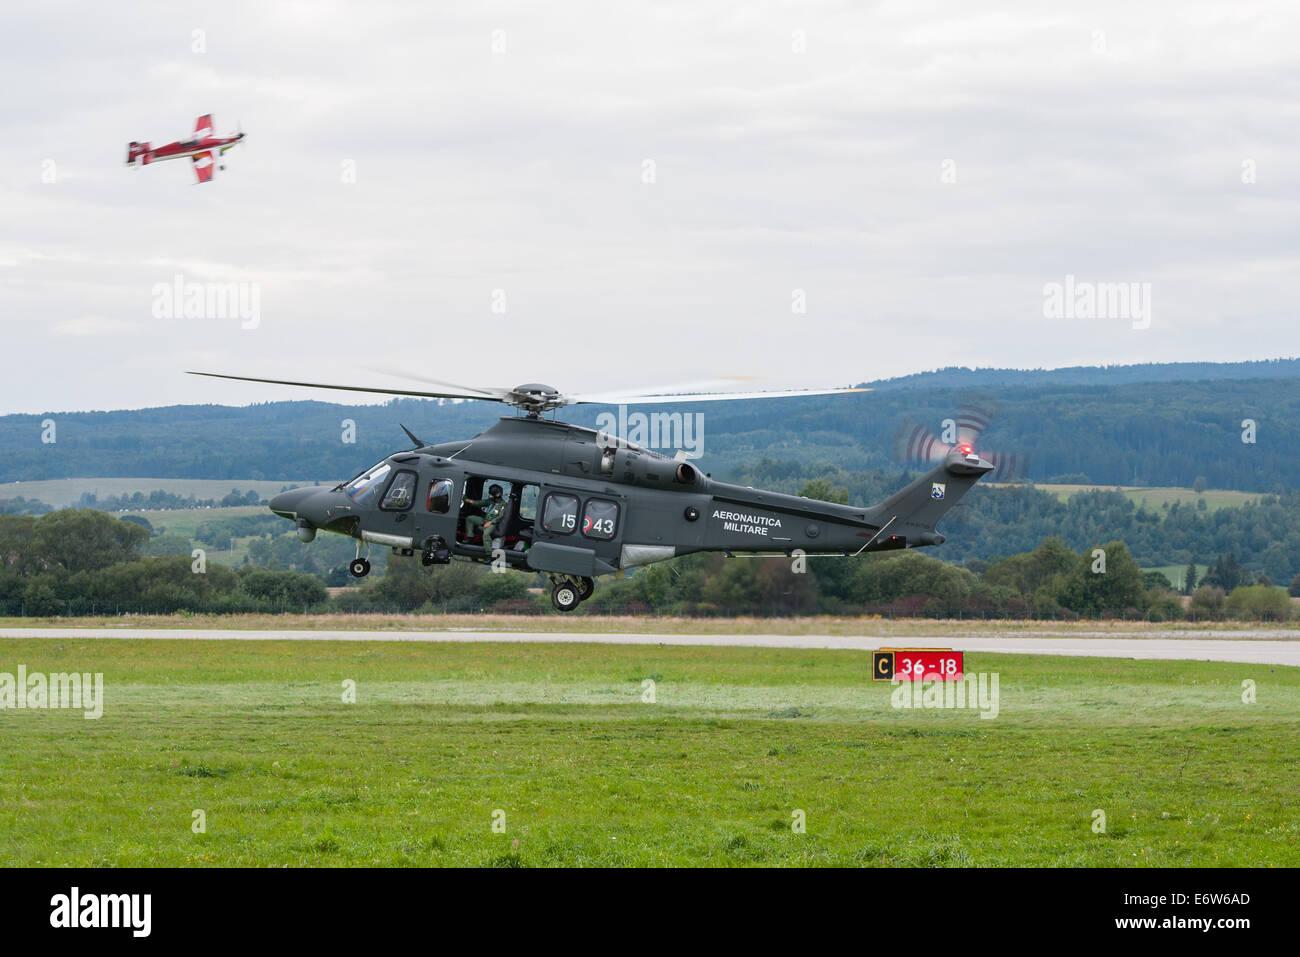 SLIAC, SLOVAKIA - AUGUST 30: Show of A-109 Agusta of Belgian Air Force during SIAF airshow in Sliac, Slovakia on - Stock Image